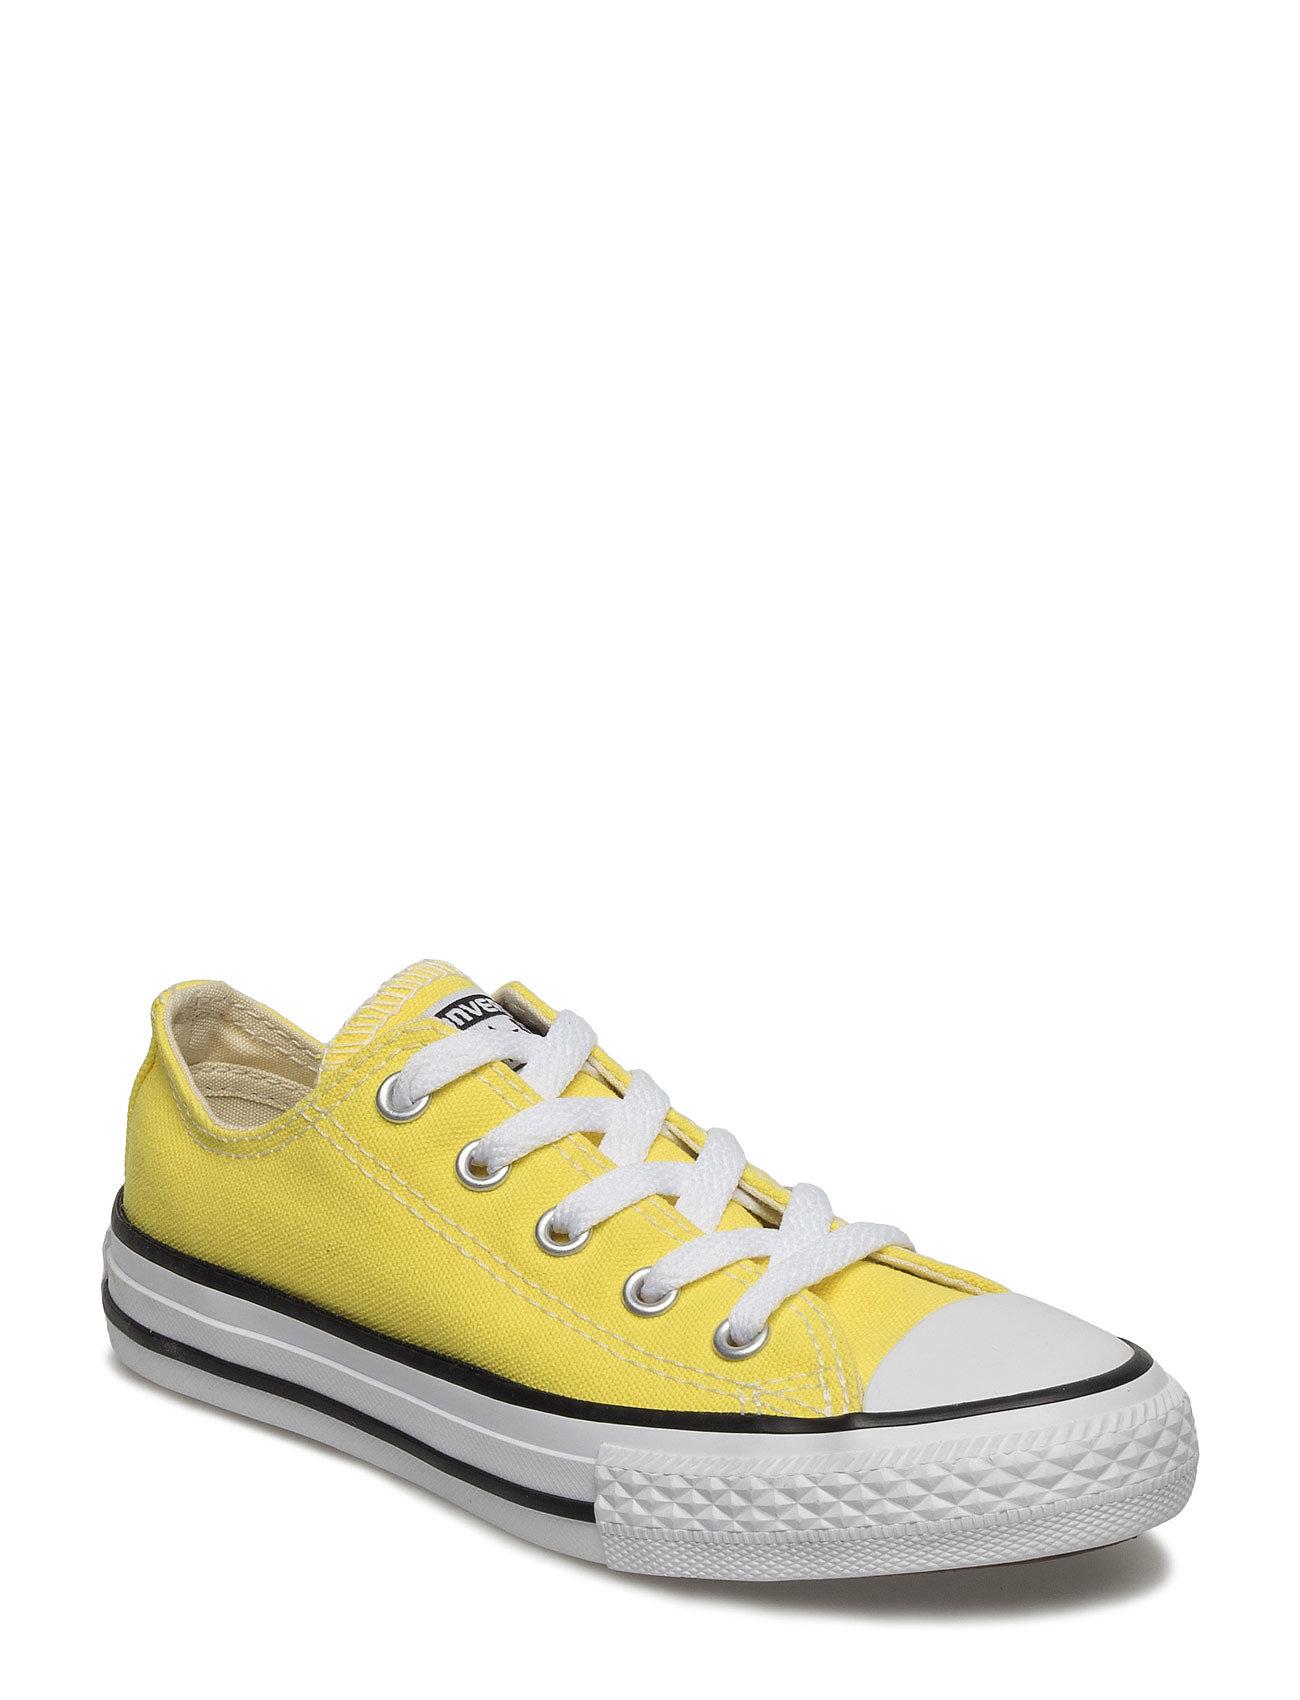 Ctas Ox Fresh Yellow